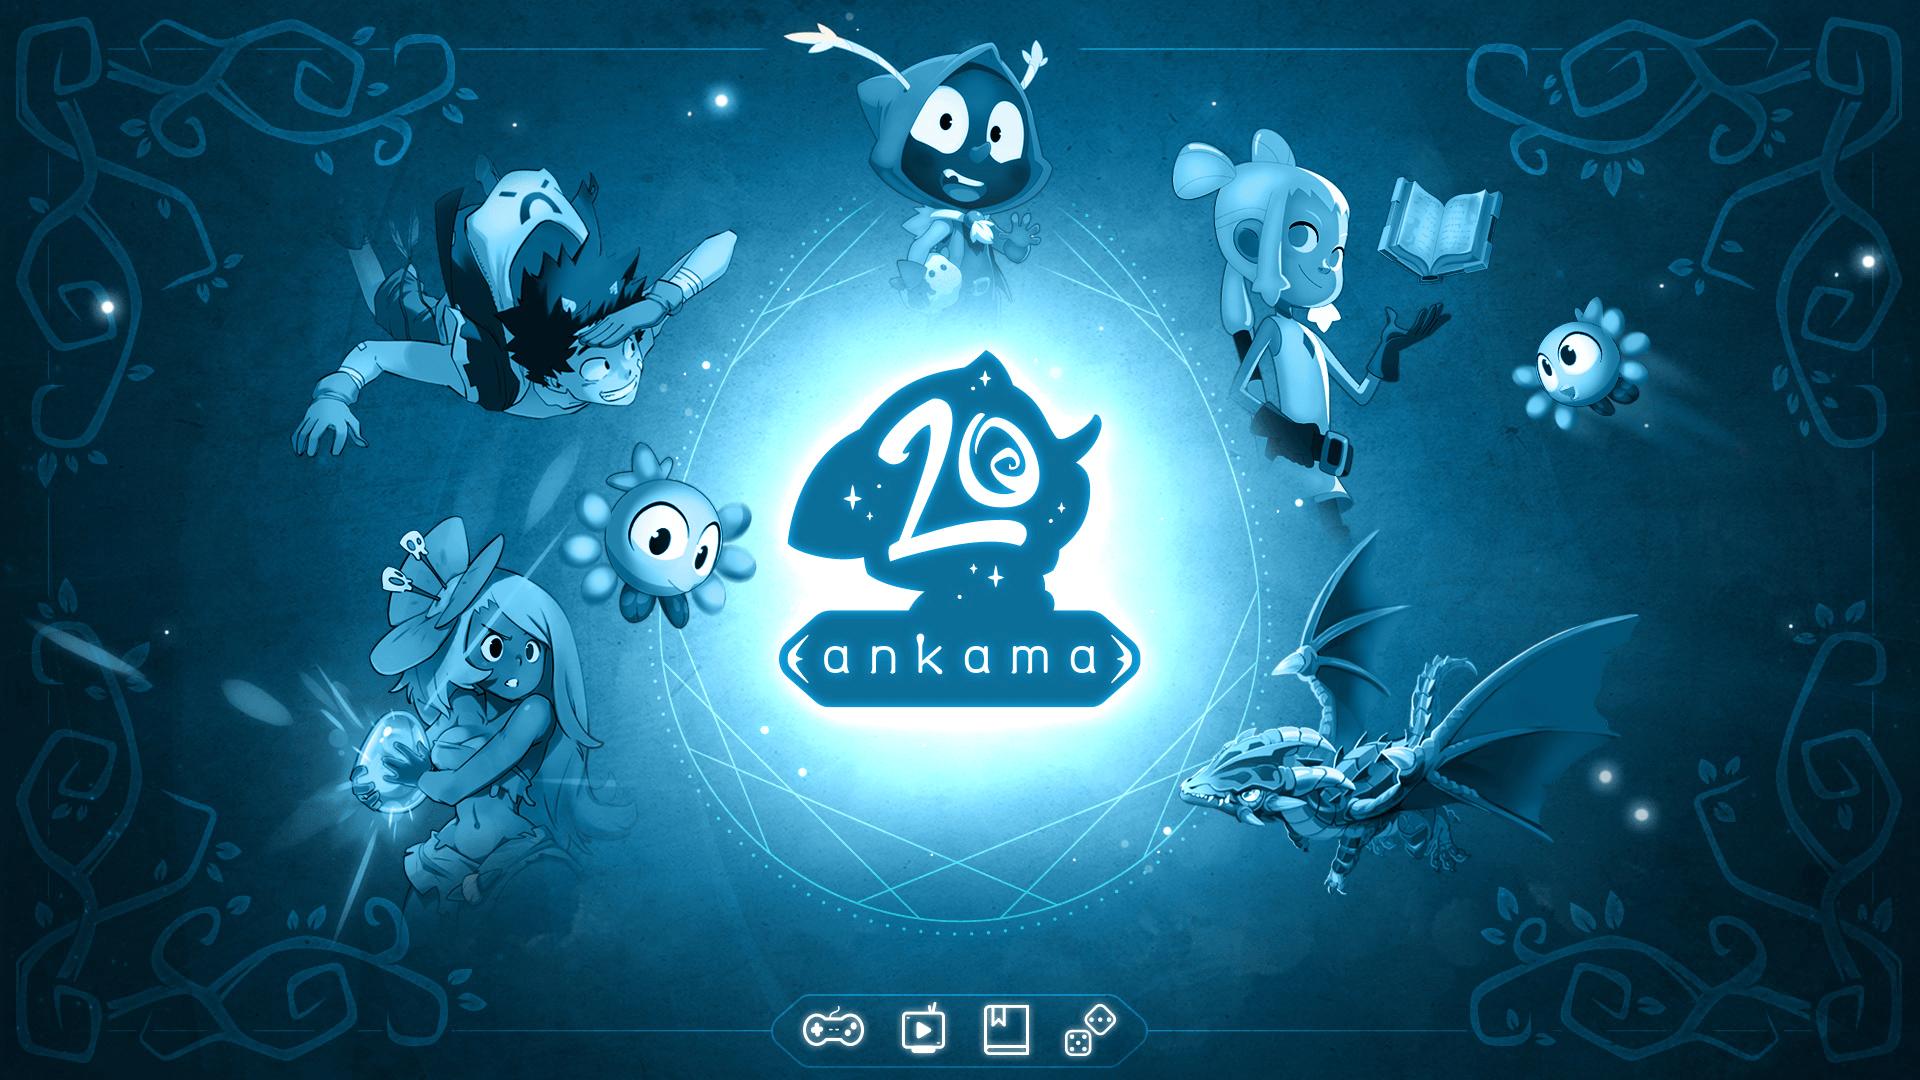 【Ankama20周年庆】各种福利大放送